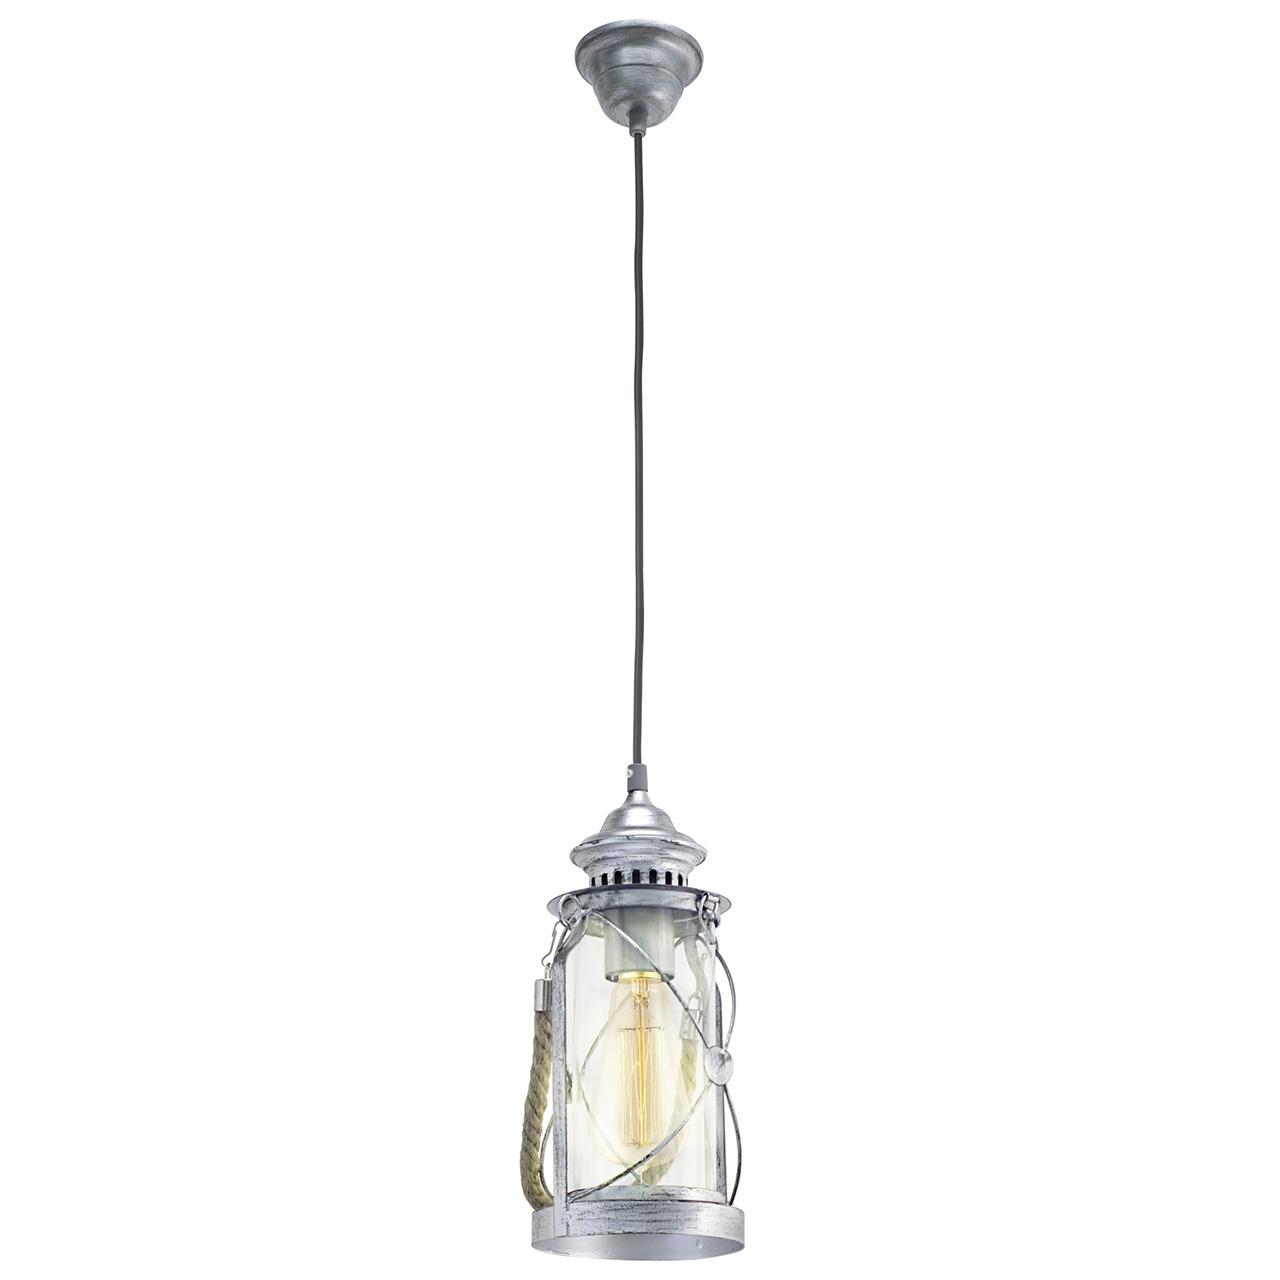 Подвесной светильник Eglo Vintage 49214 абажур eglo vintage 49659